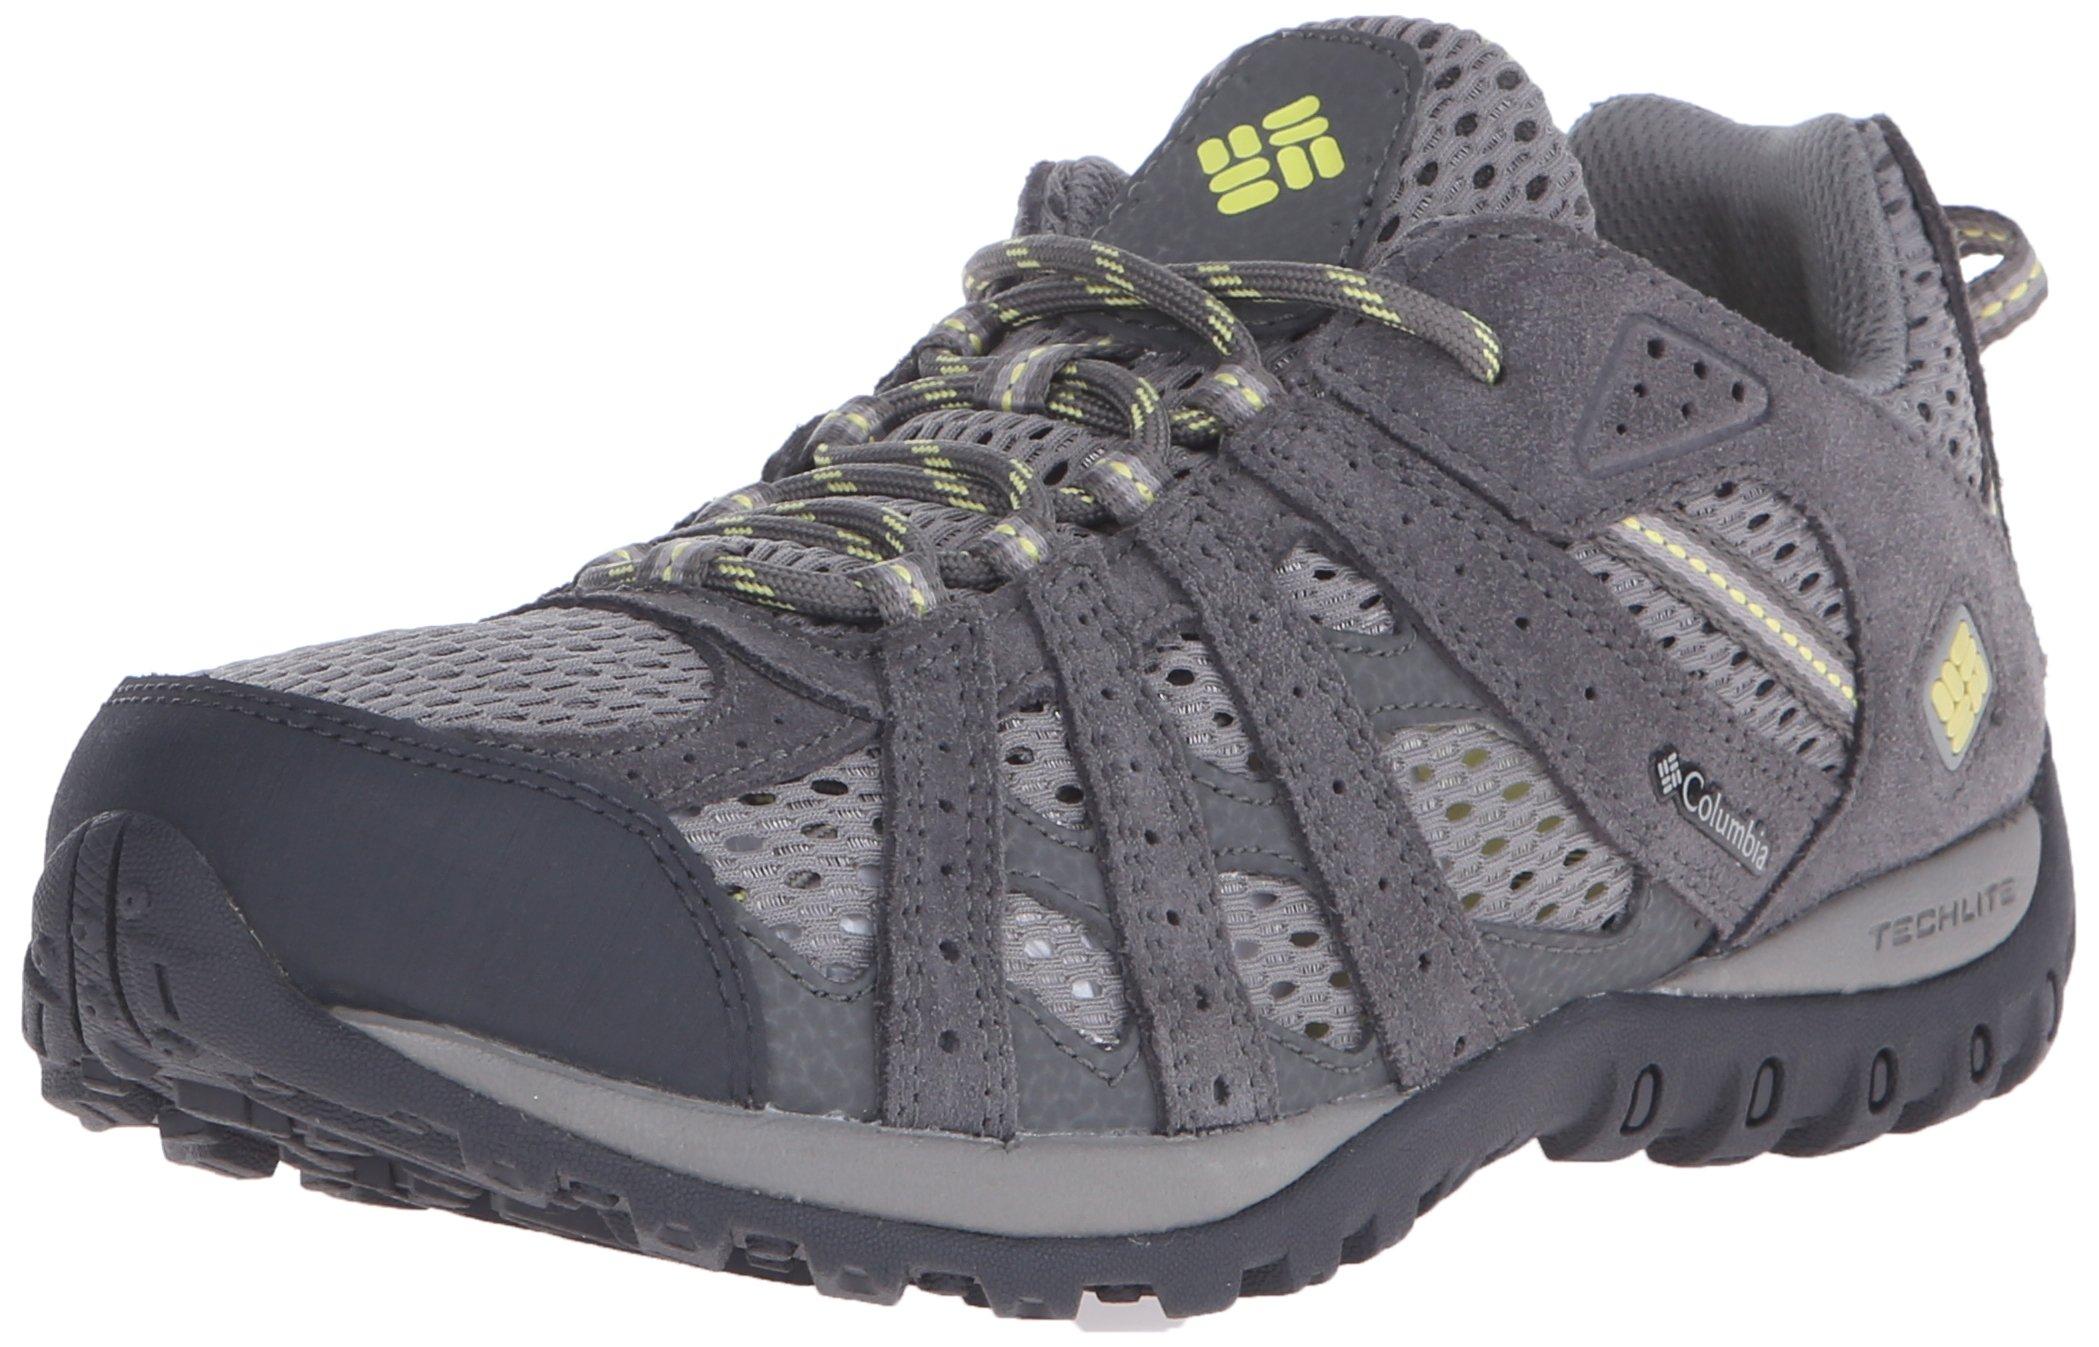 Columbia Women's Redmond Breeze Trail Shoe, Light Grey/Sunnyside, 8.5 B US